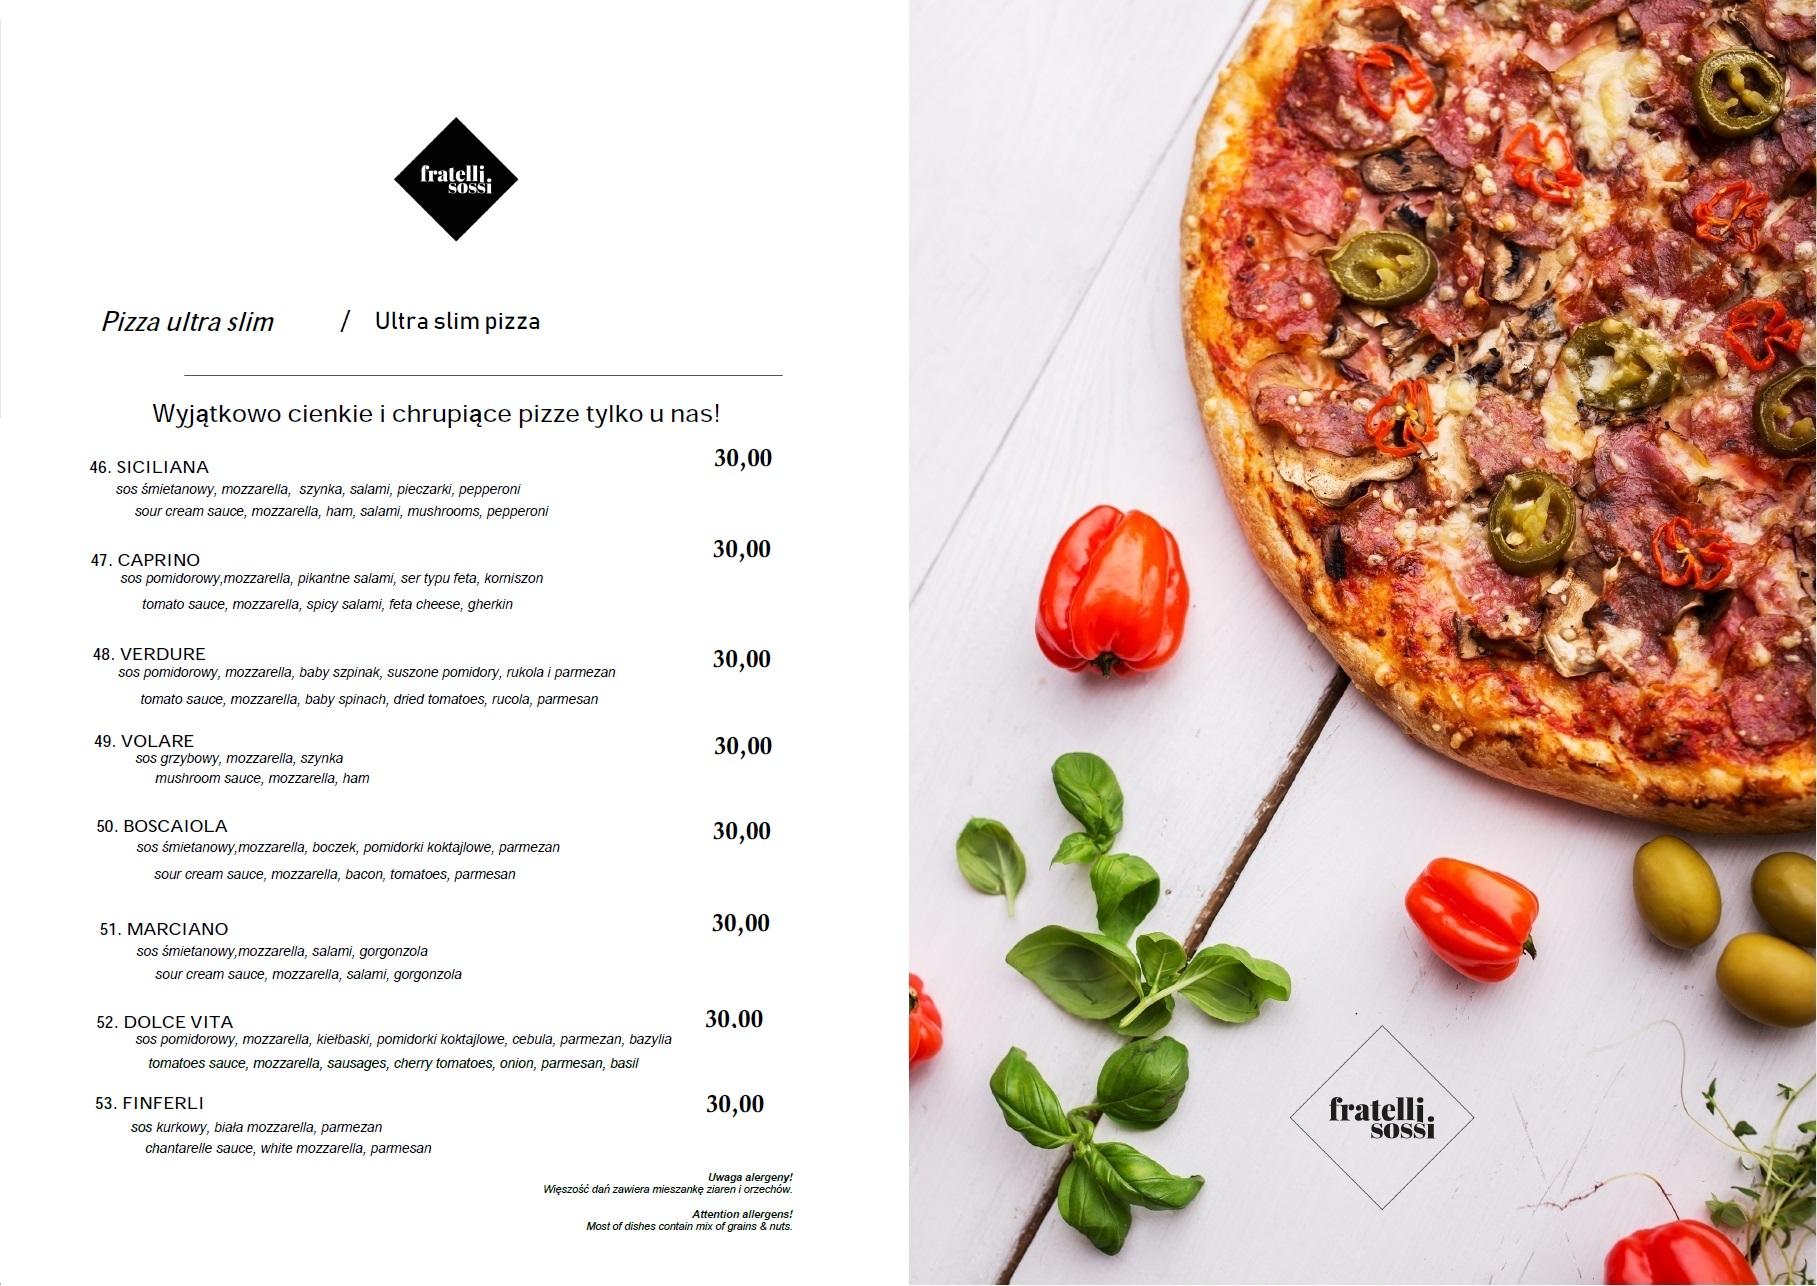 10. pizza ultra slim